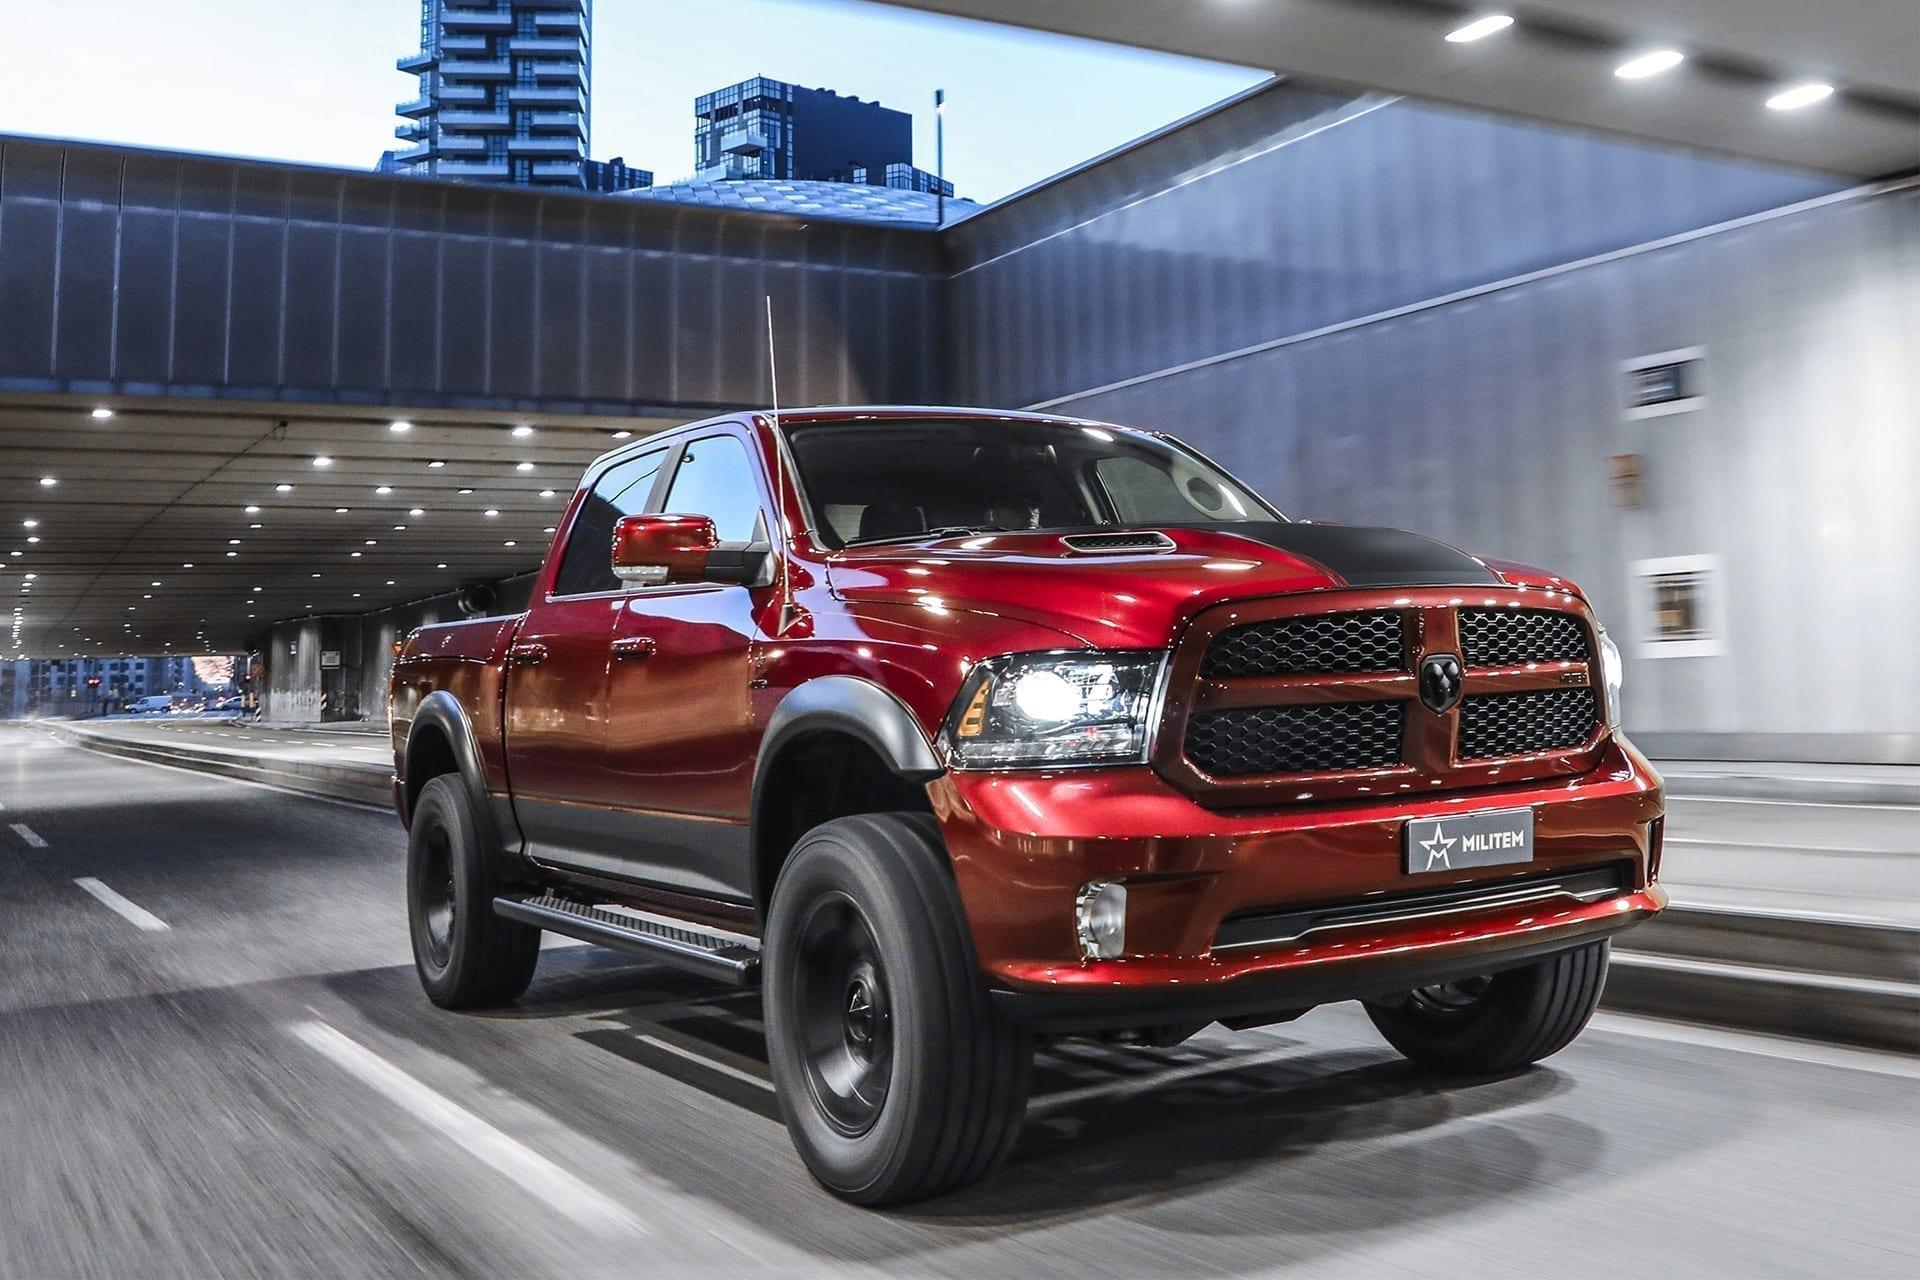 luxury american pick-up militem